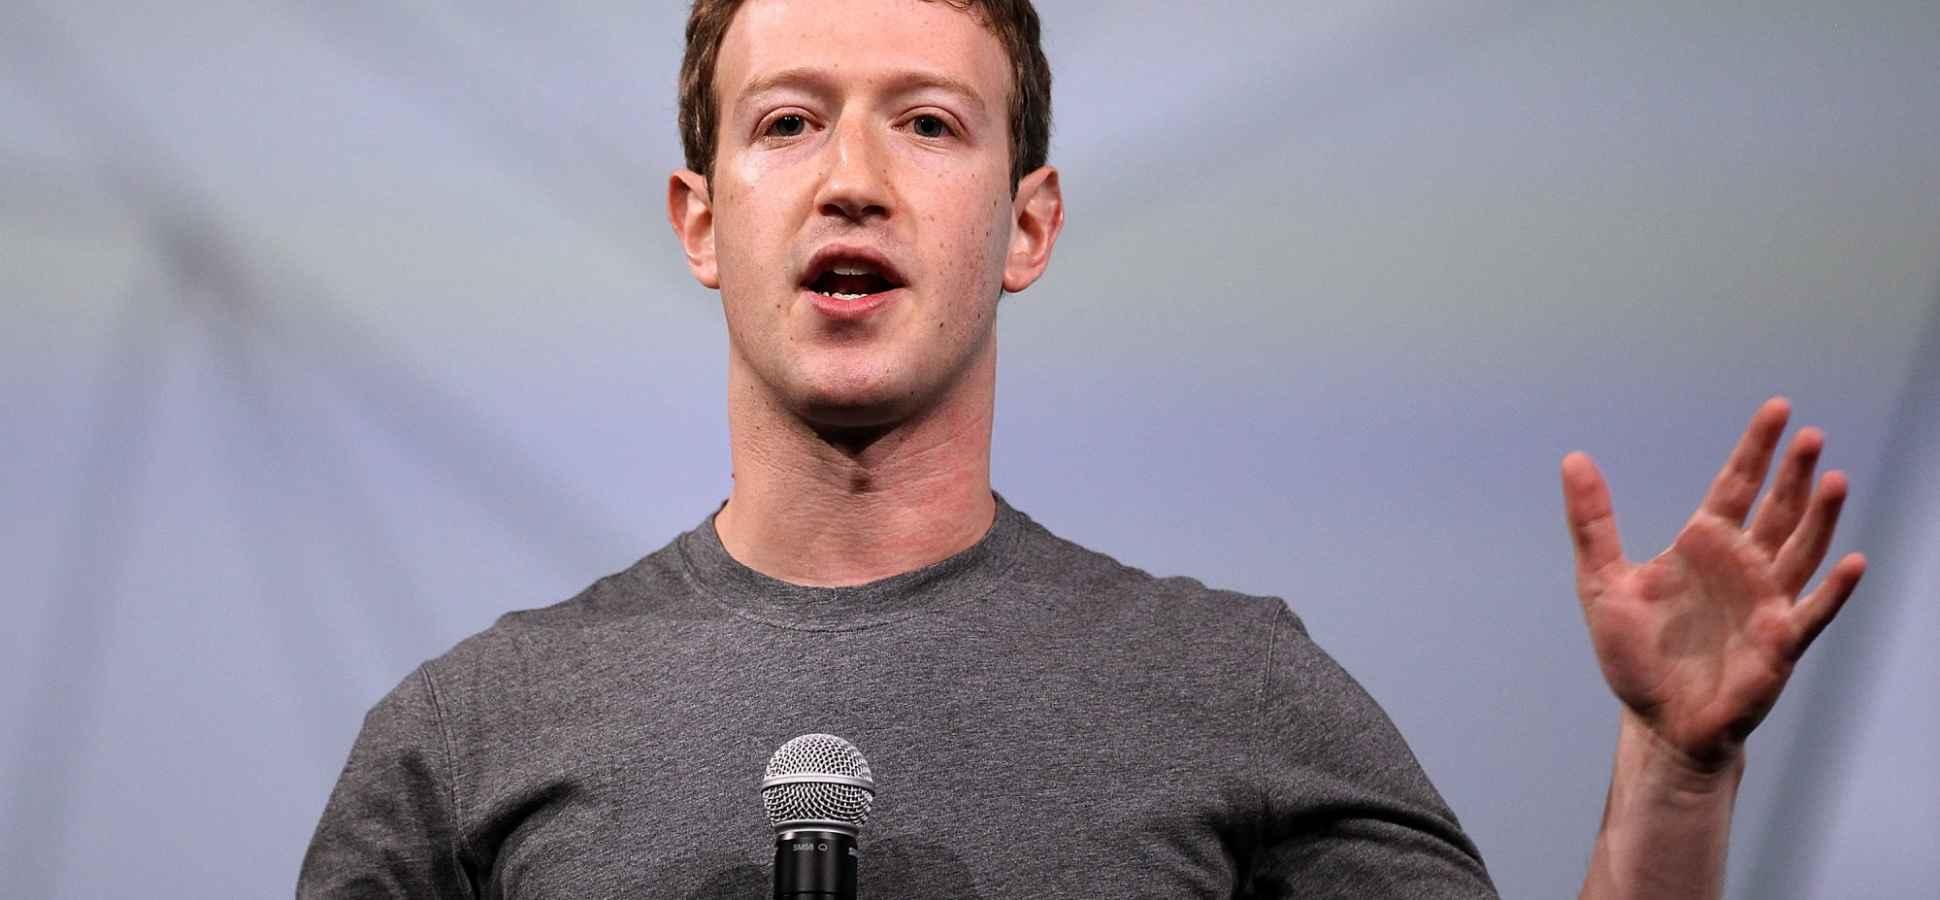 How to Not 'Mark Zuckerberg' Your LinkedIn Account